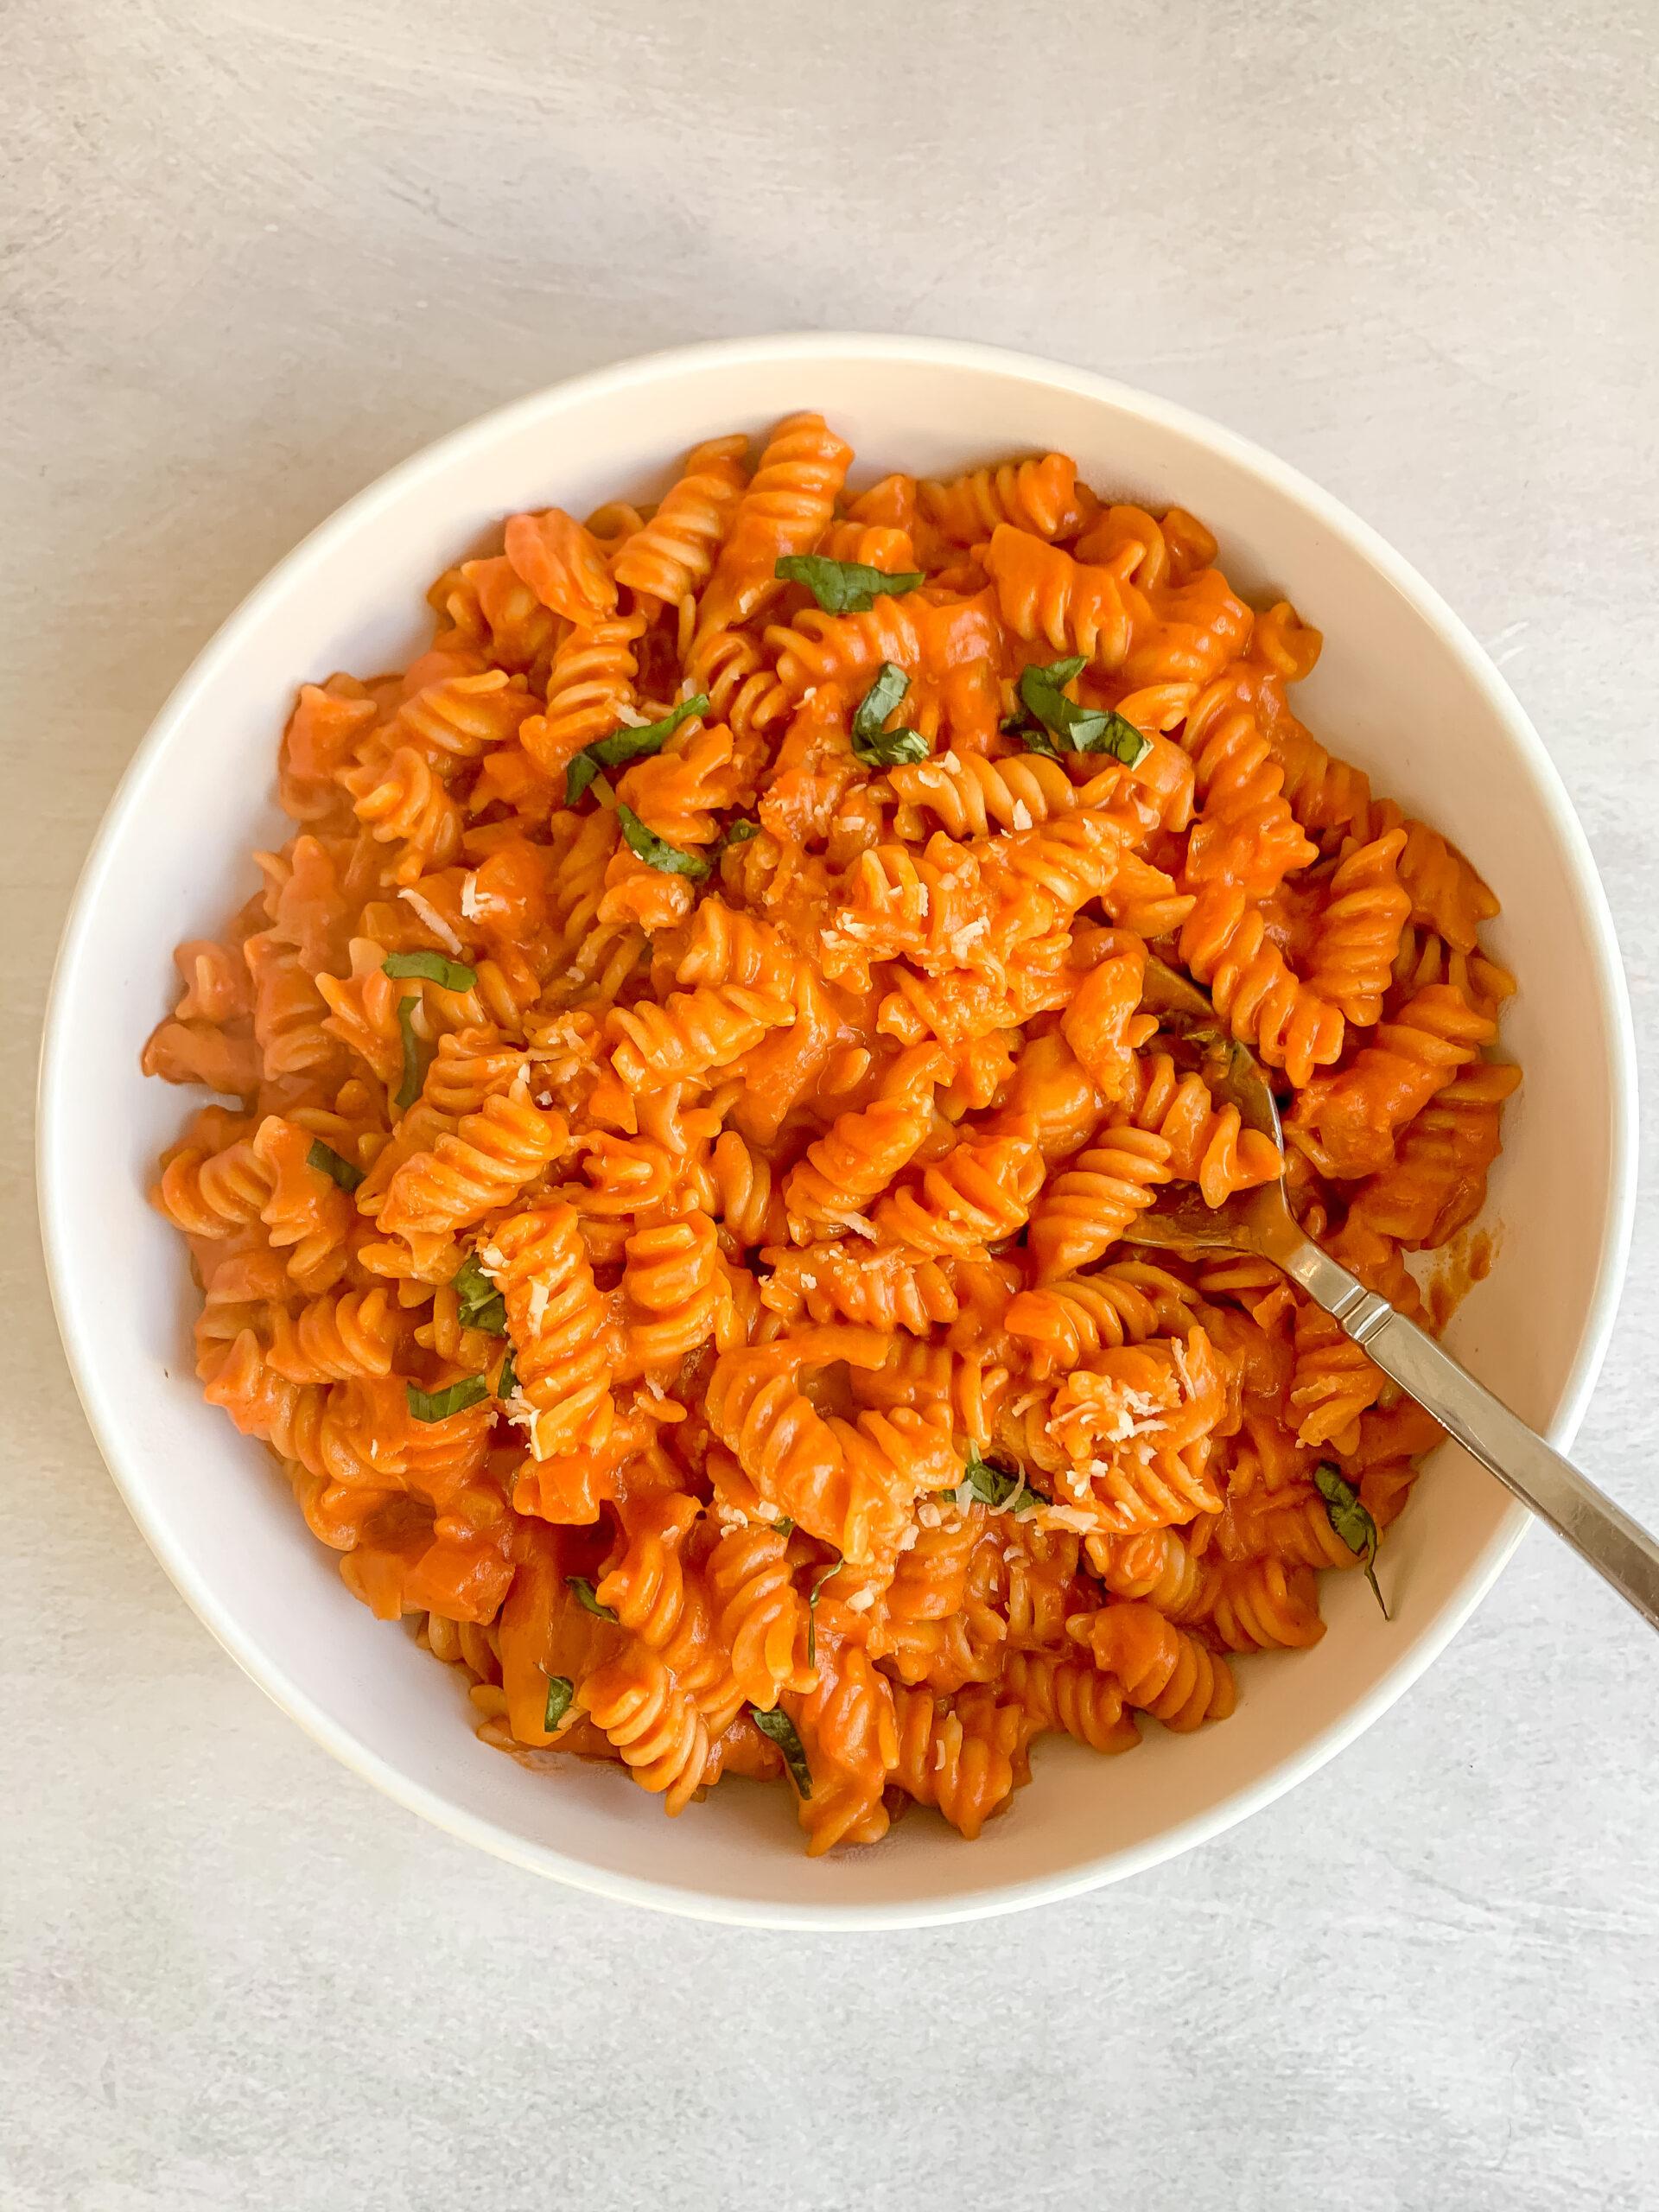 Spicy Fusilli Pasta with Tomato + Cream (Gluten Free, Vegetarian, Dairy Free friendly)